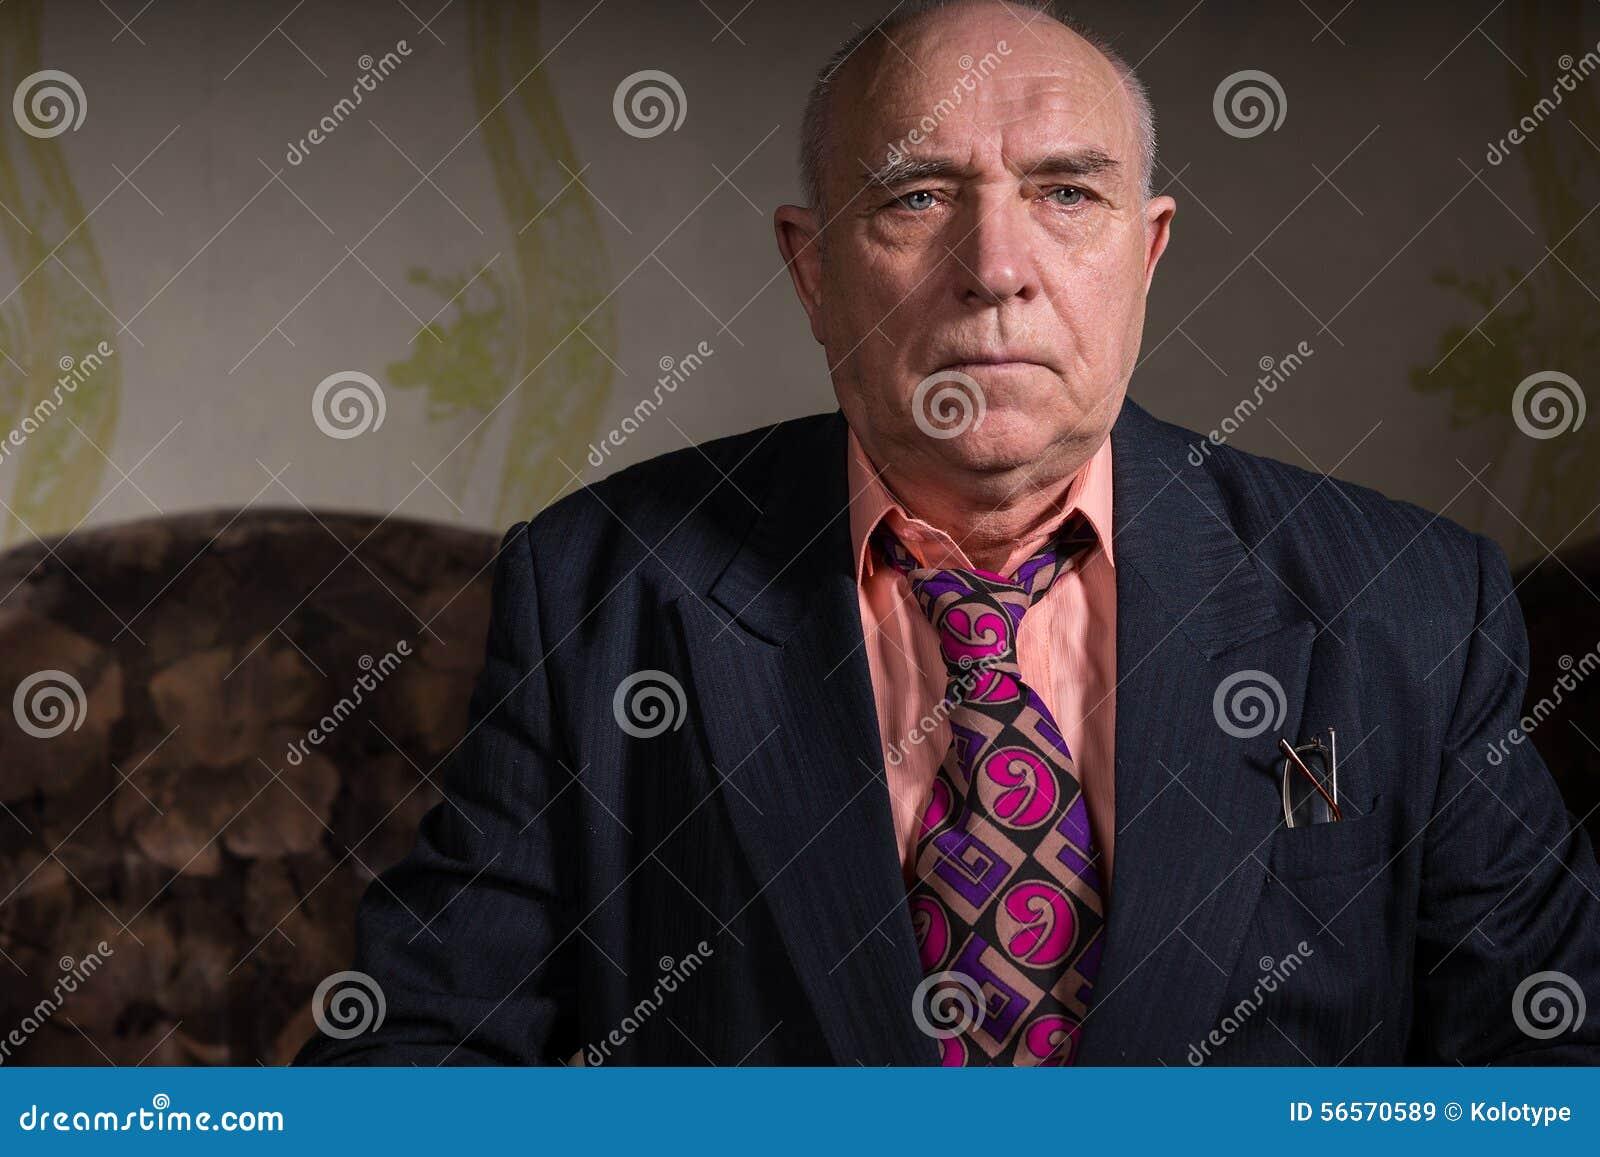 Download Ακριβής παλαιά συνεδρίαση επιχειρηματιών στο δωμάτιό του Στοκ Εικόνα - εικόνα από σακάκι, ηλικιωμένοι: 56570589